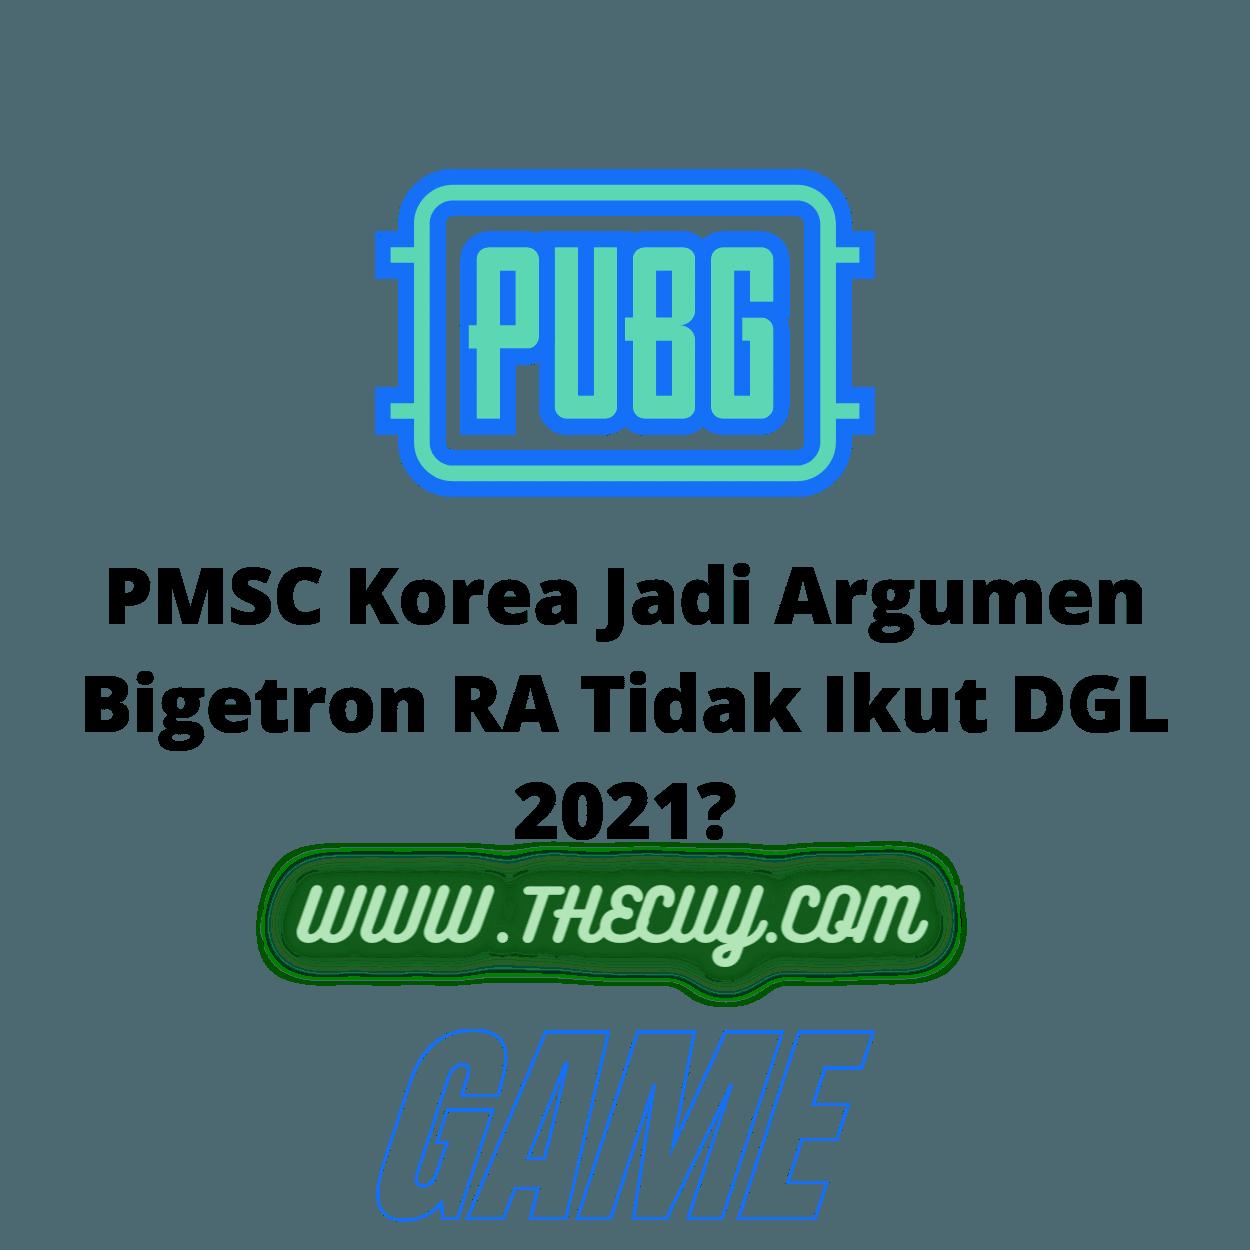 PMSC Korea Jadi Argumen Bigetron RA Tidak Ikut DGL 2021?